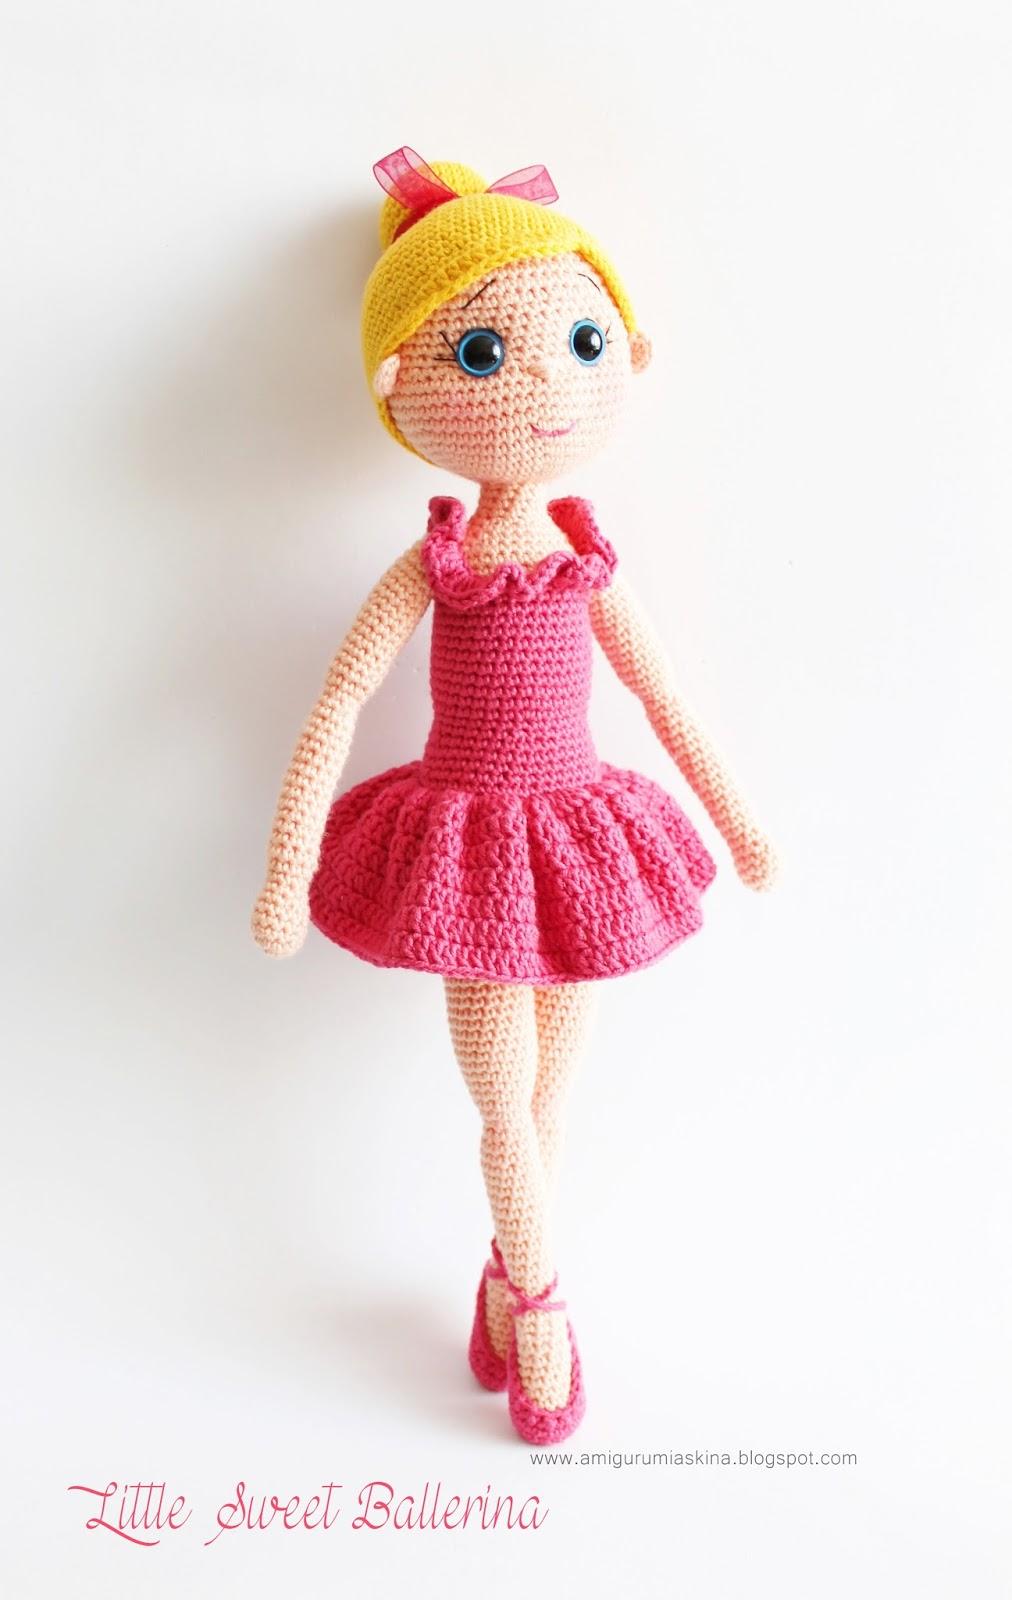 Amigurumi Ballerina Doll : Amigurumi Balerin Bebek- Amigurumi Ballerina Doll ...